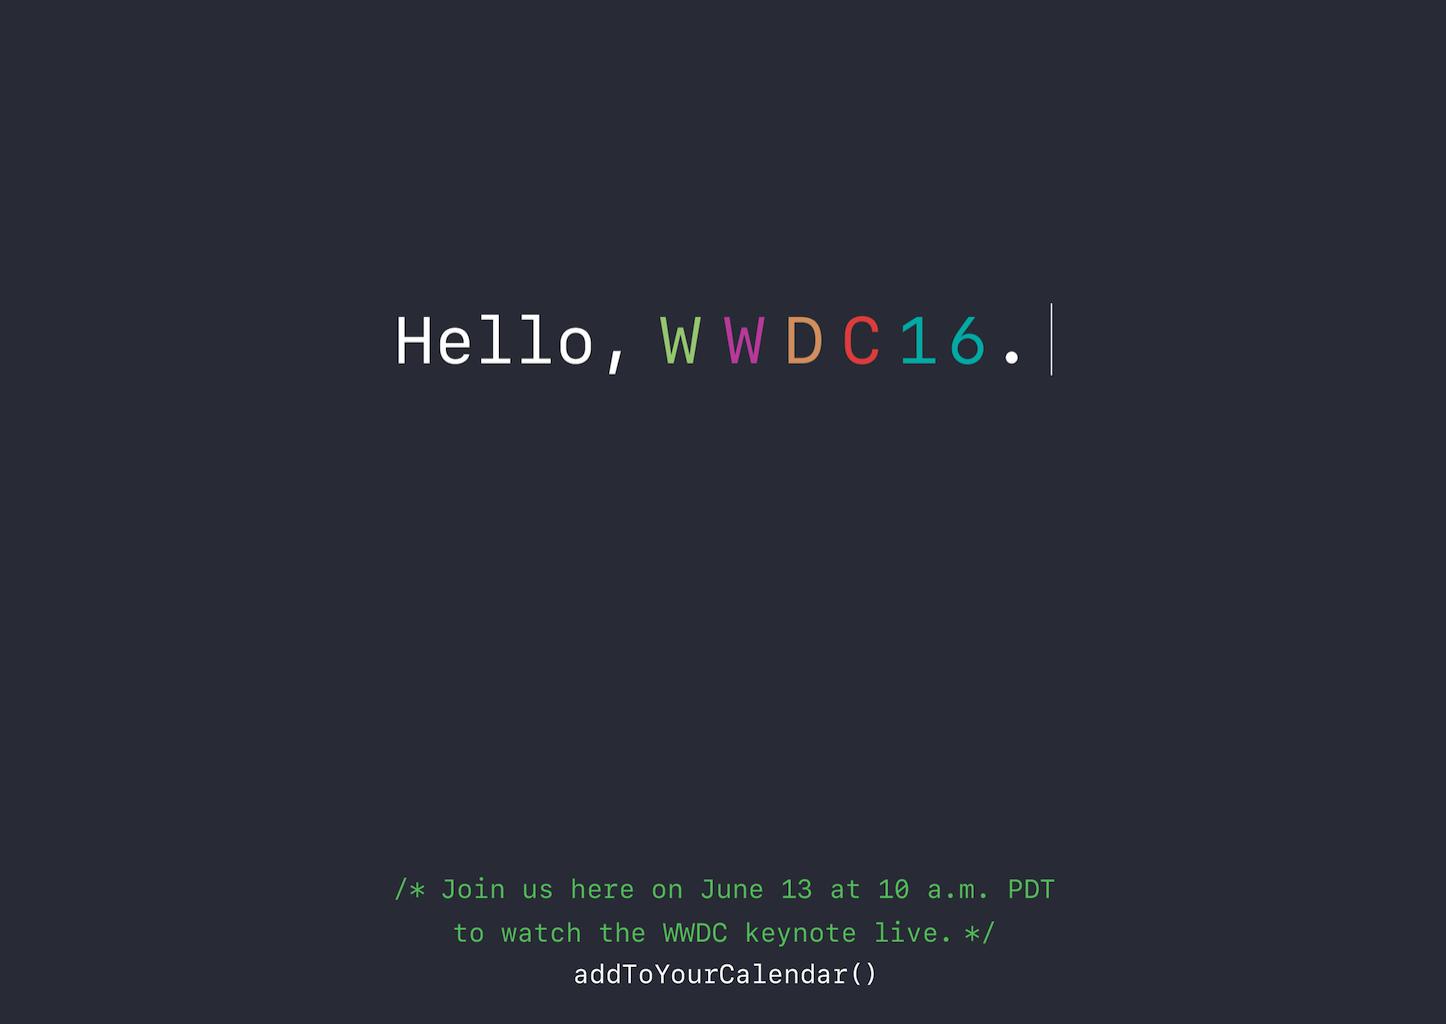 Apple WWDC 2016 Live Keynote